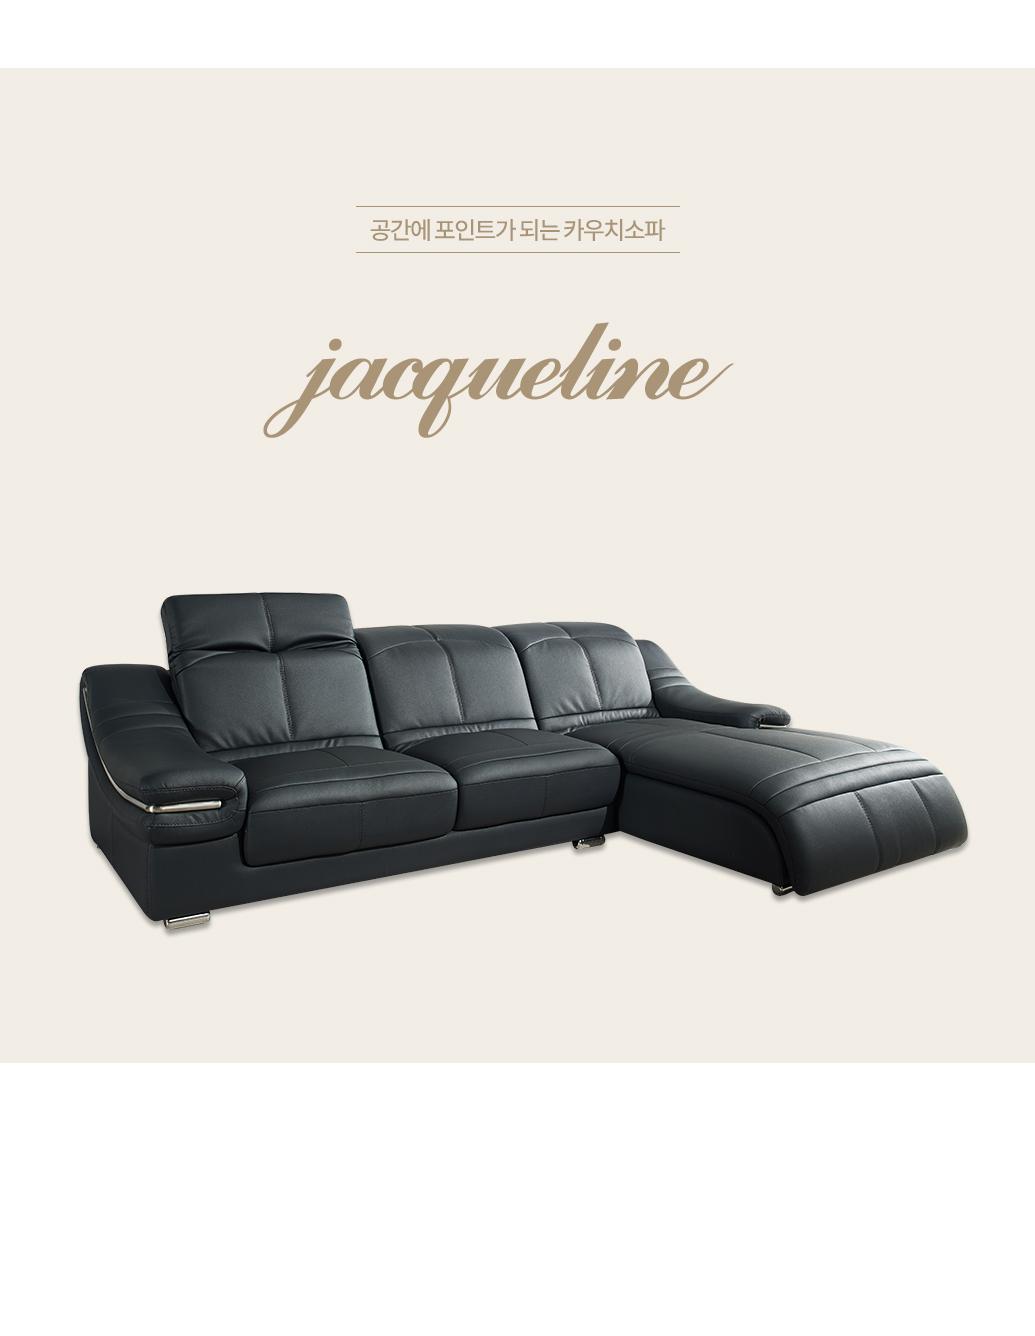 jacqueline08.jpg